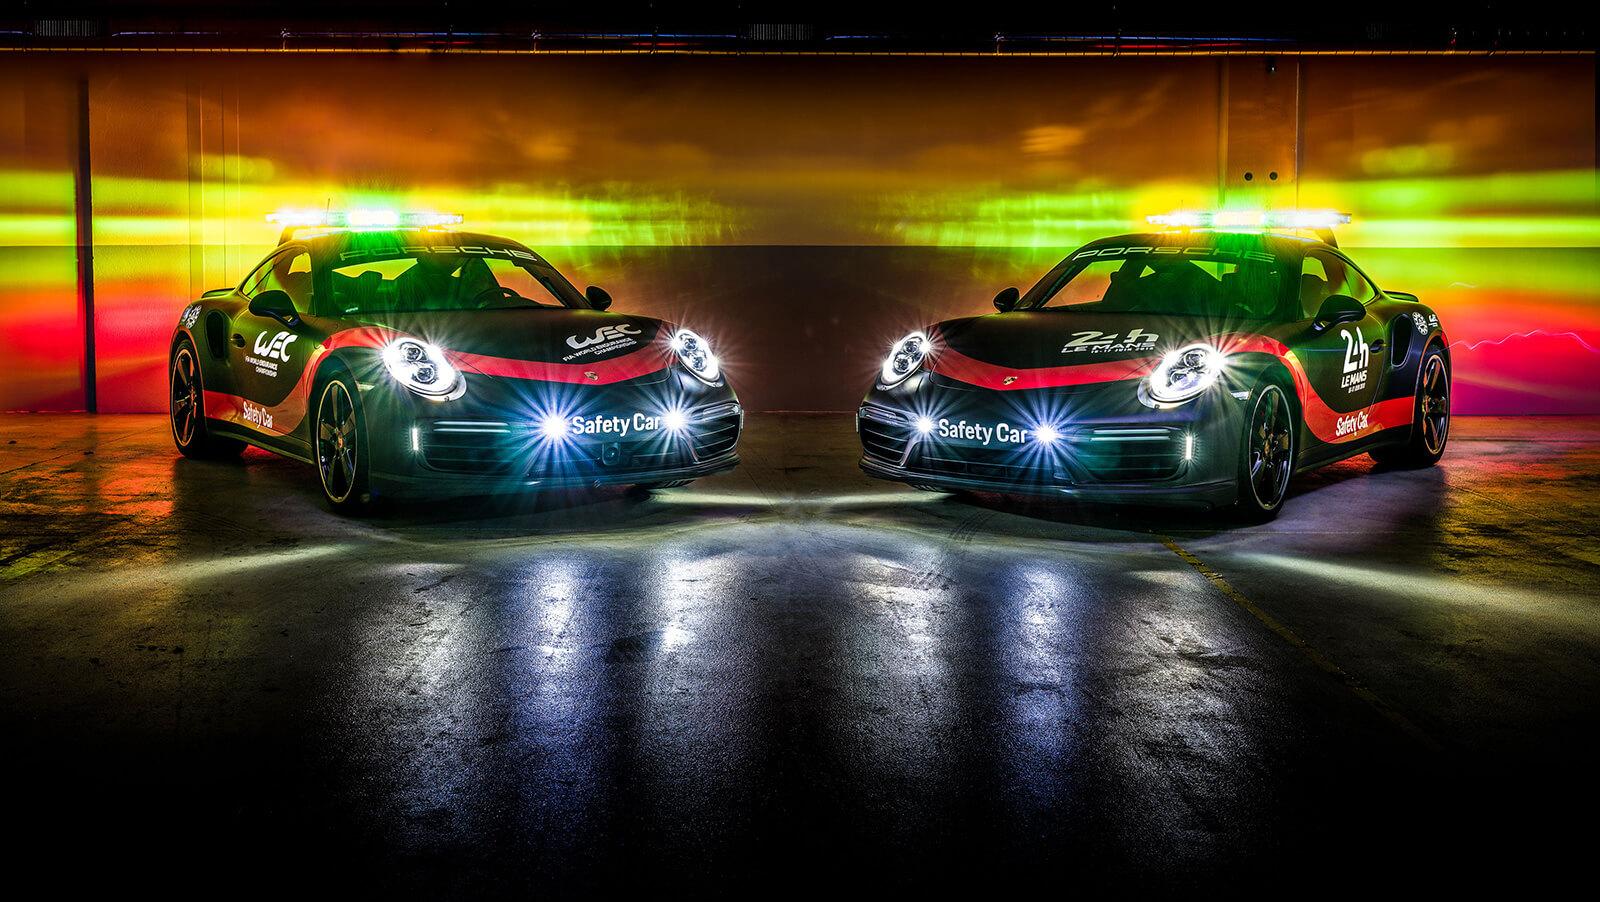 Porsche 911 Turbo safety car for WEC